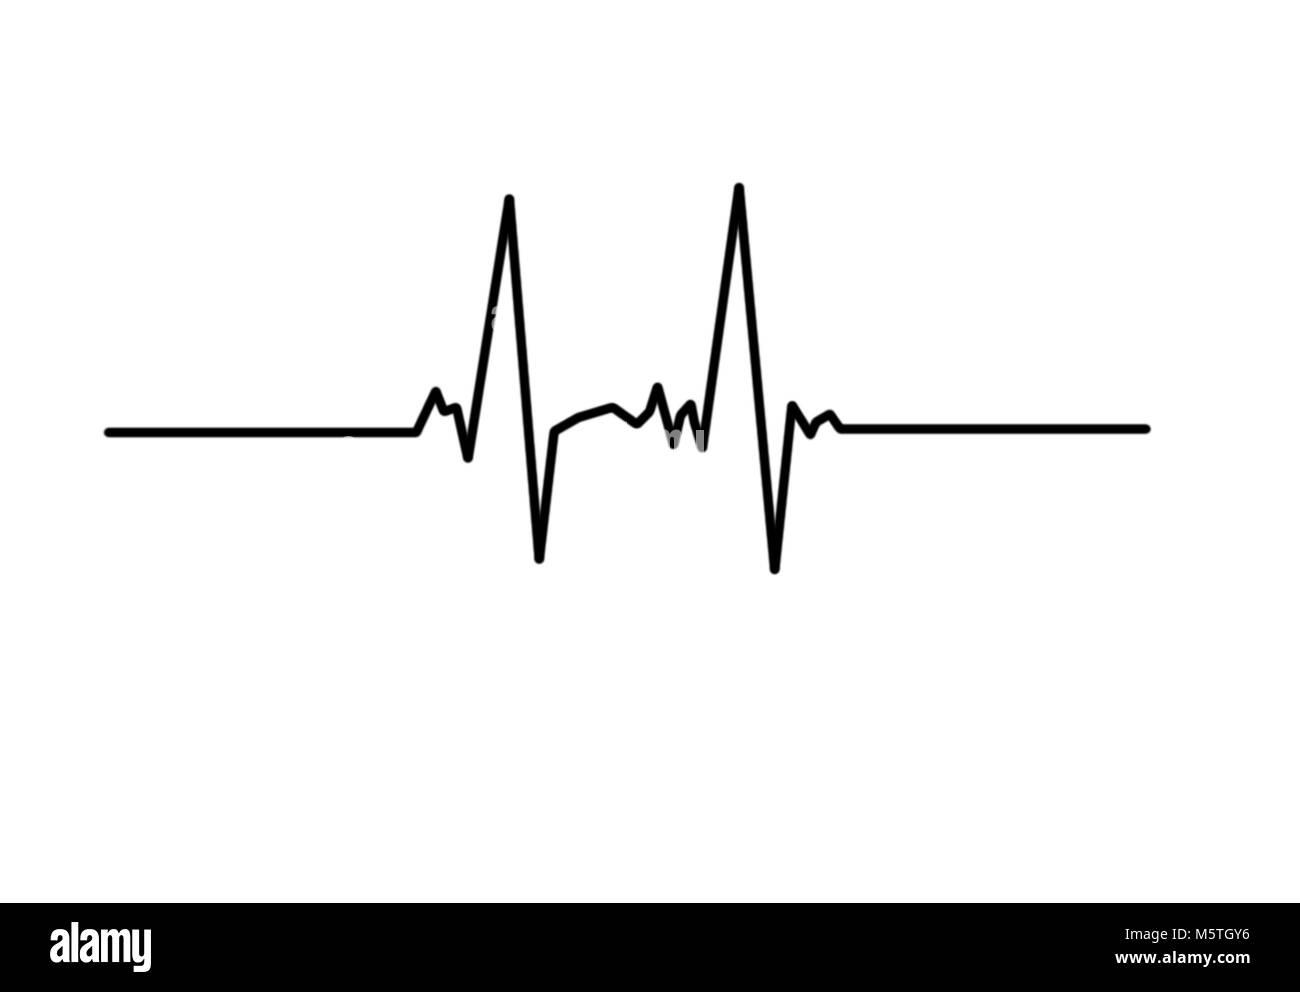 heartbeat icon, life line cardiogram illustration